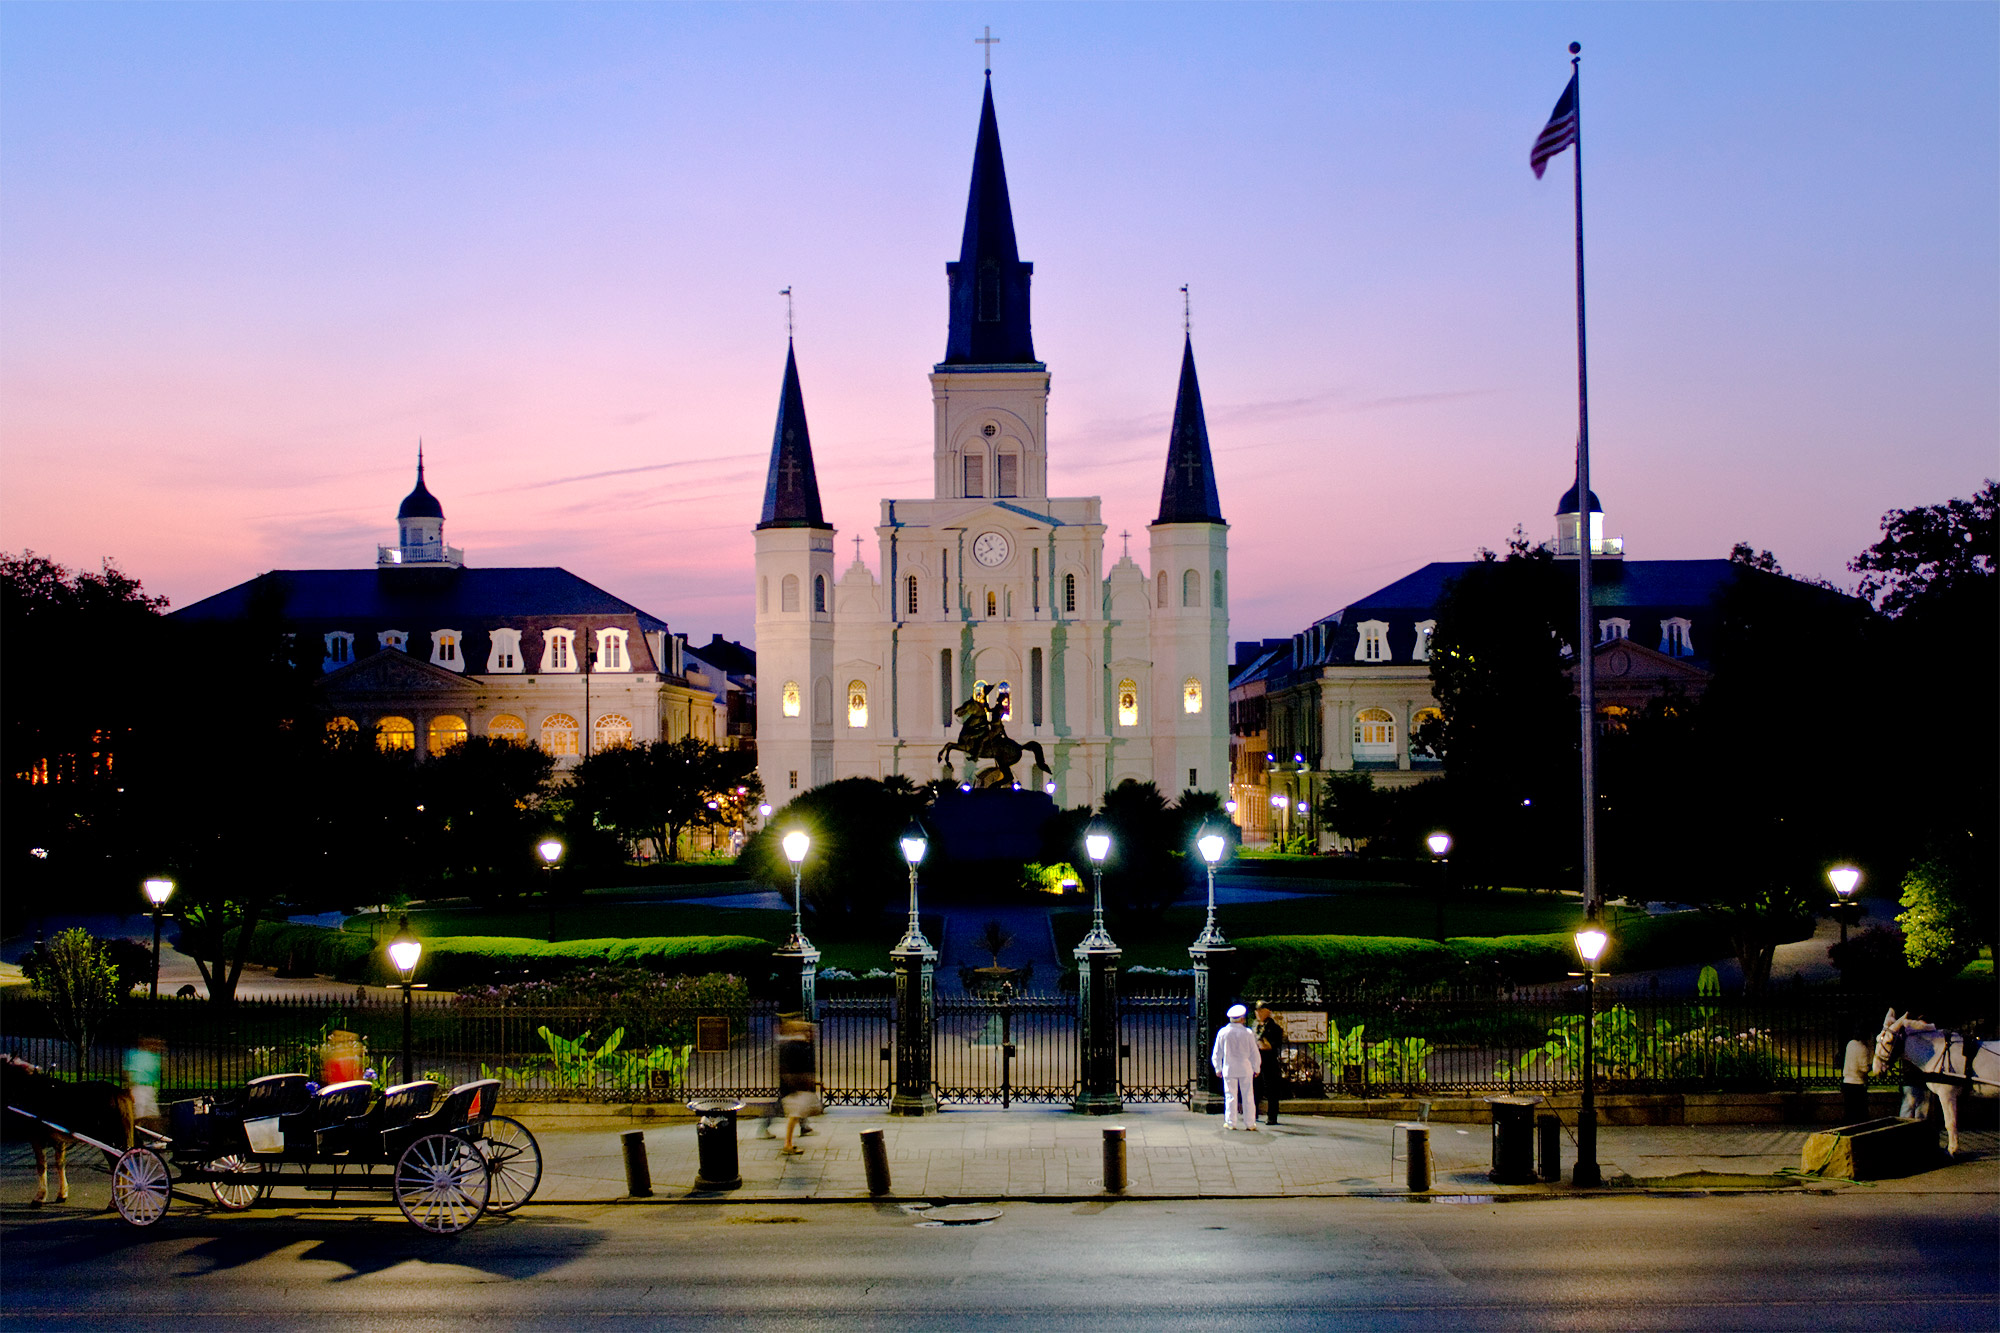 Igreja St. Louis Cathedral em Nova Orleans, Estados Unidos